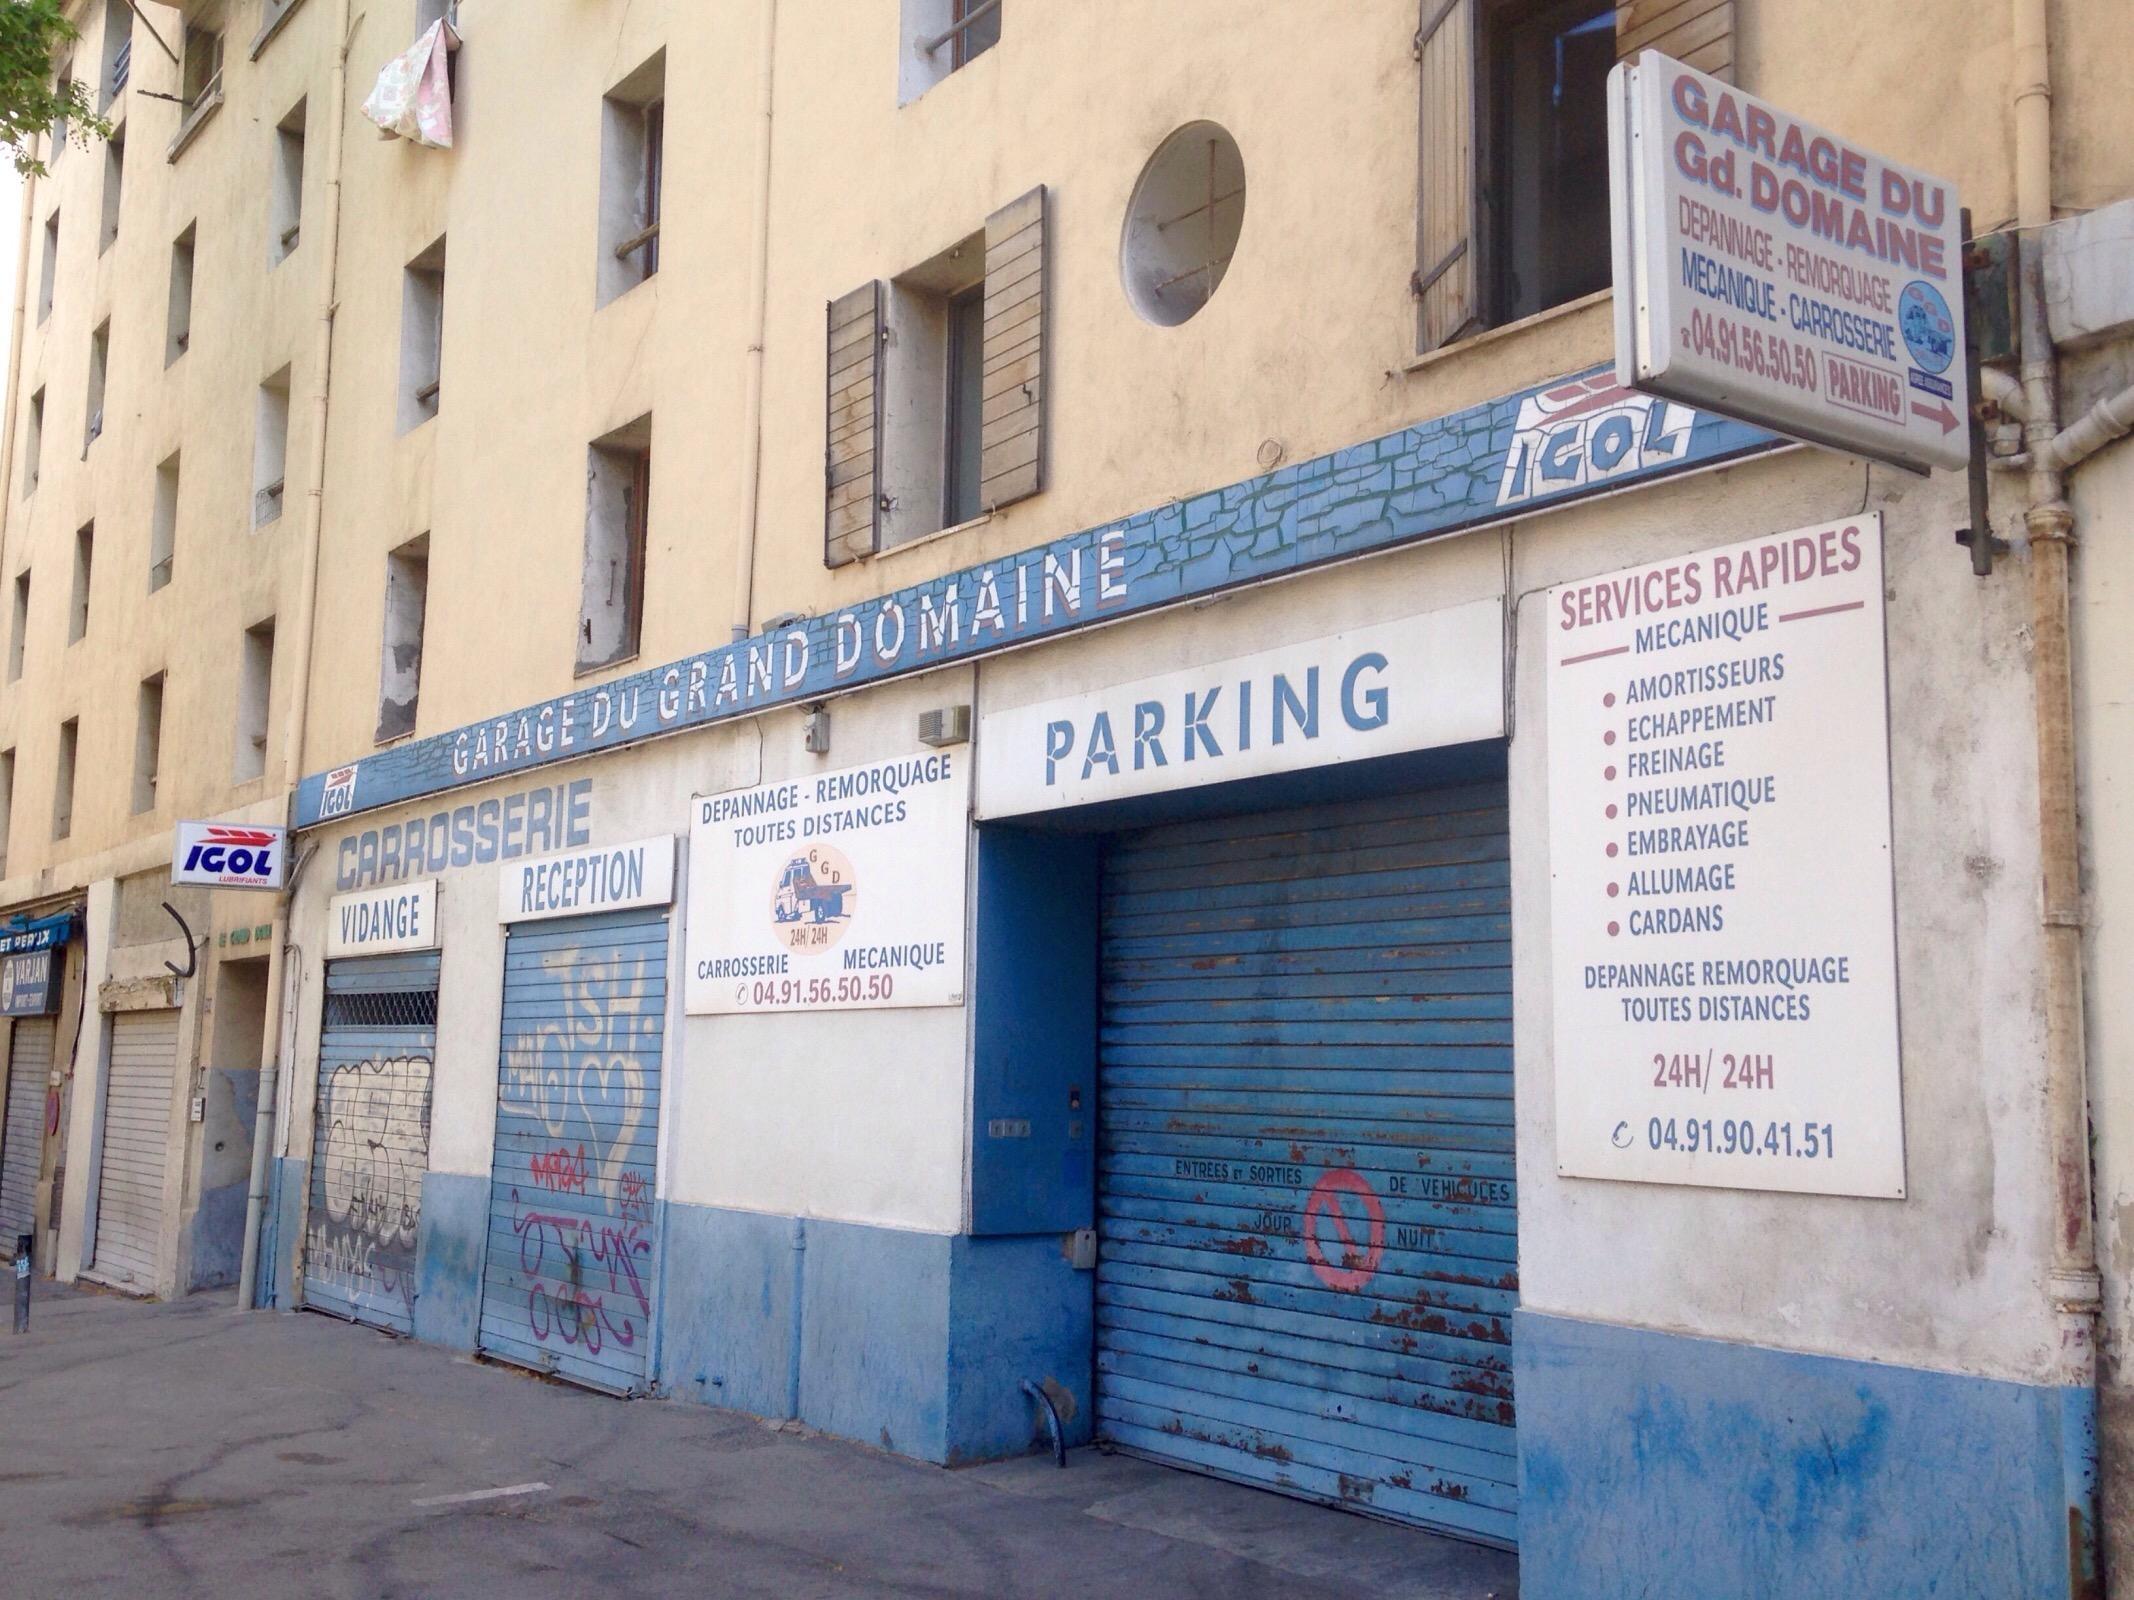 Garage du grand domaine parking in marseille parkme for Garage avenue du maine